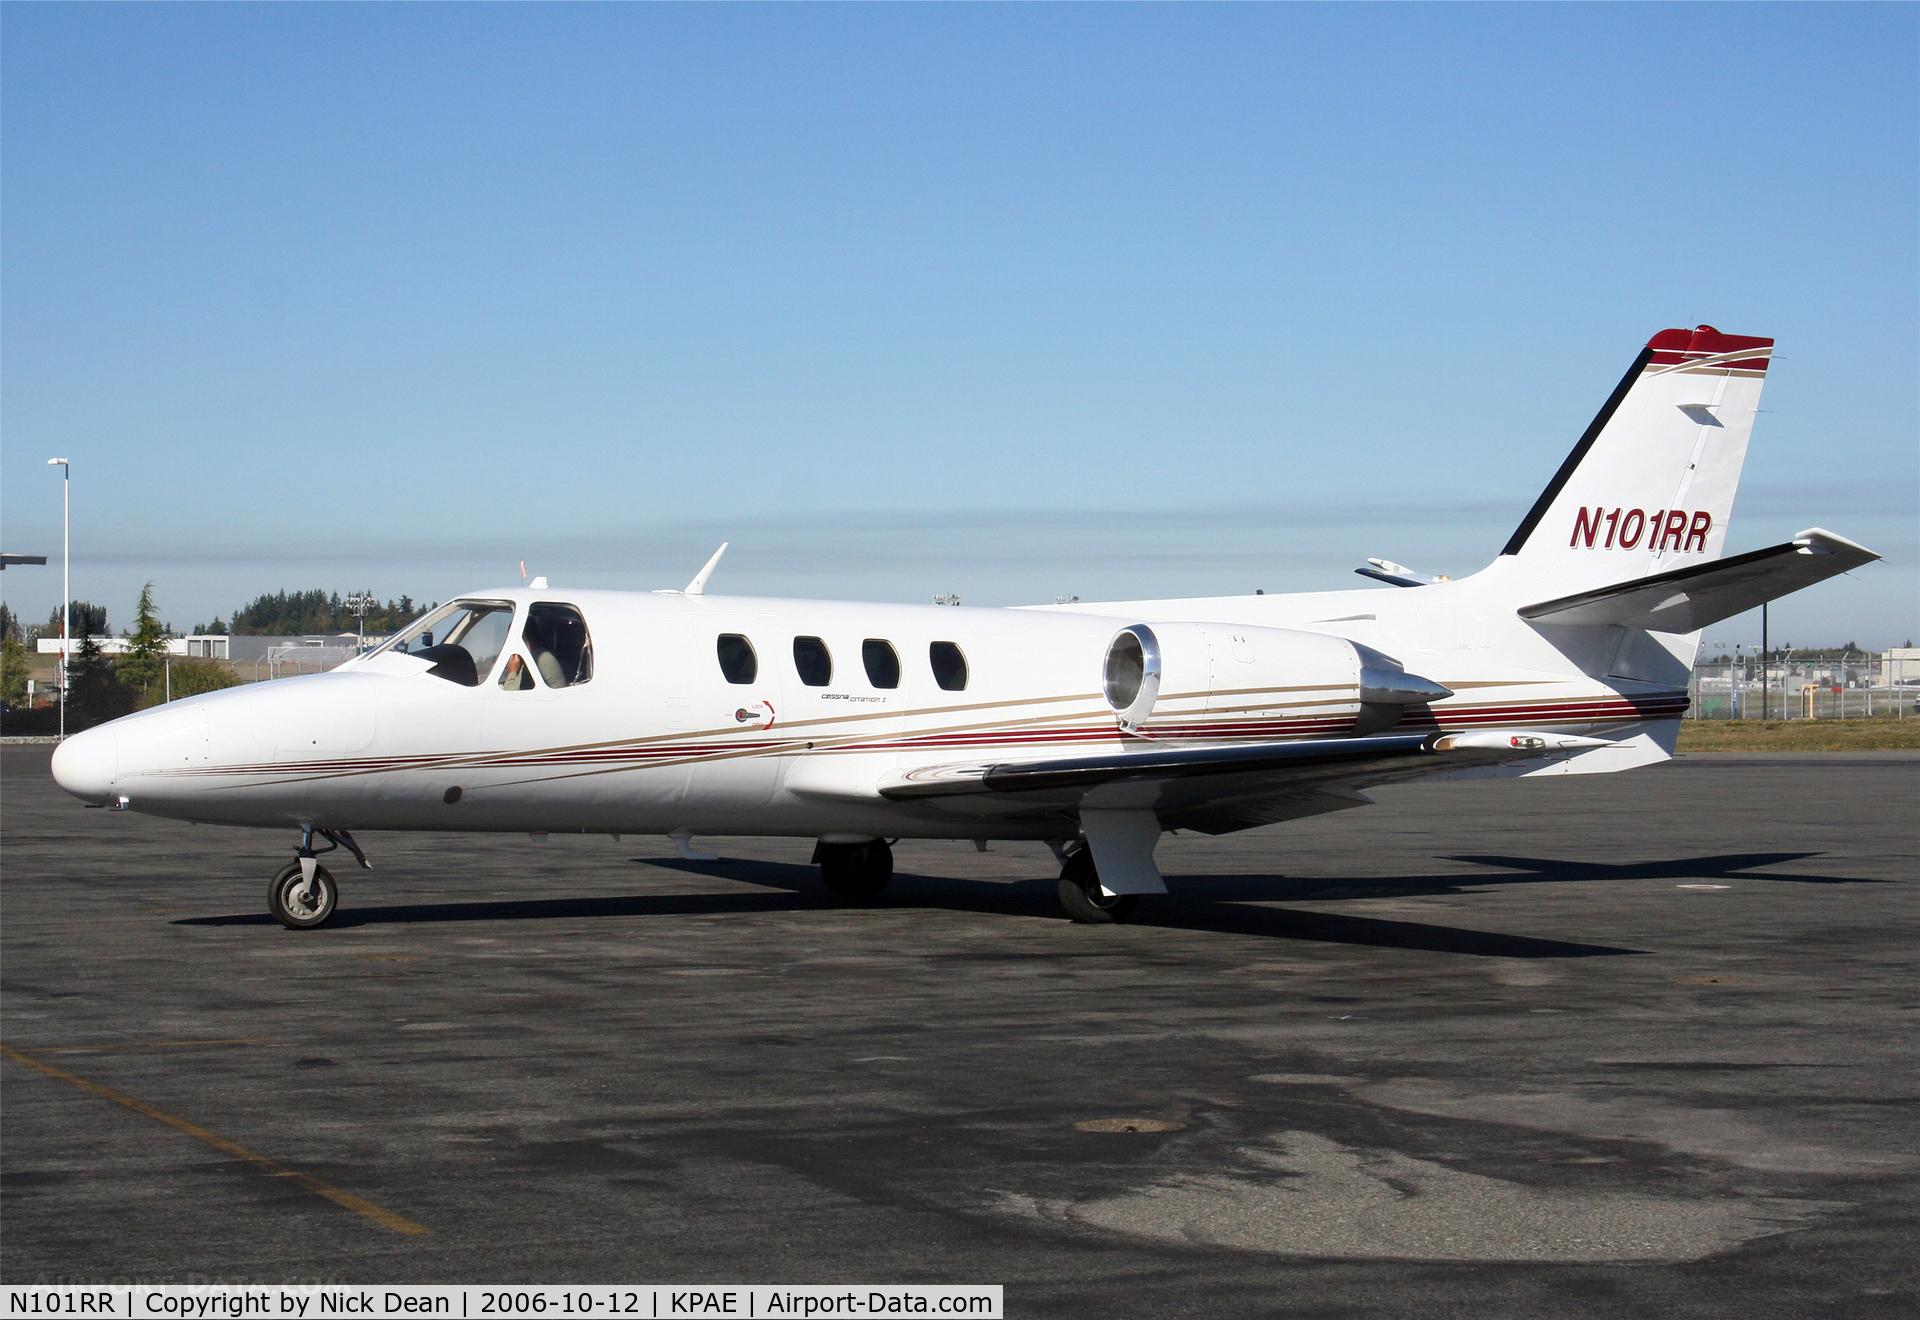 N101RR, 1982 Cessna 501 Citation I/SP C/N 5010241, KPAE